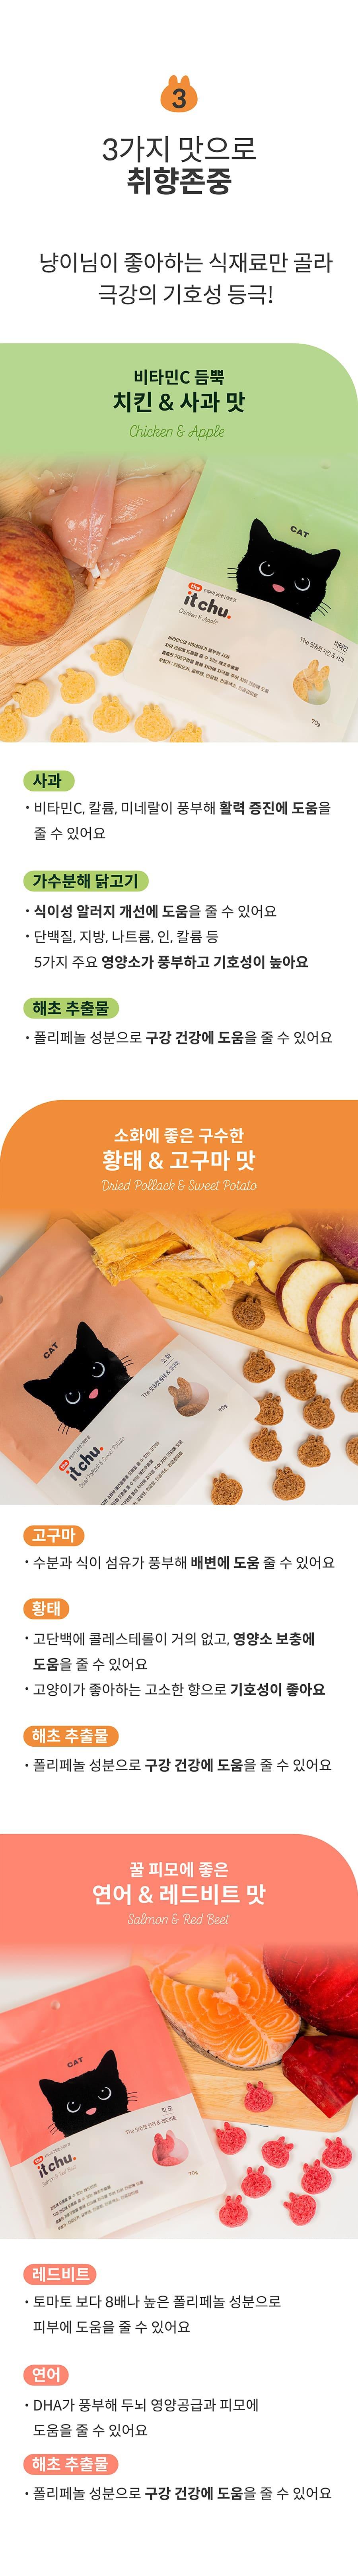 it 더 잇츄 캣 (치킨&사과/황태&고구마/연어&레드비트)-상품이미지-13